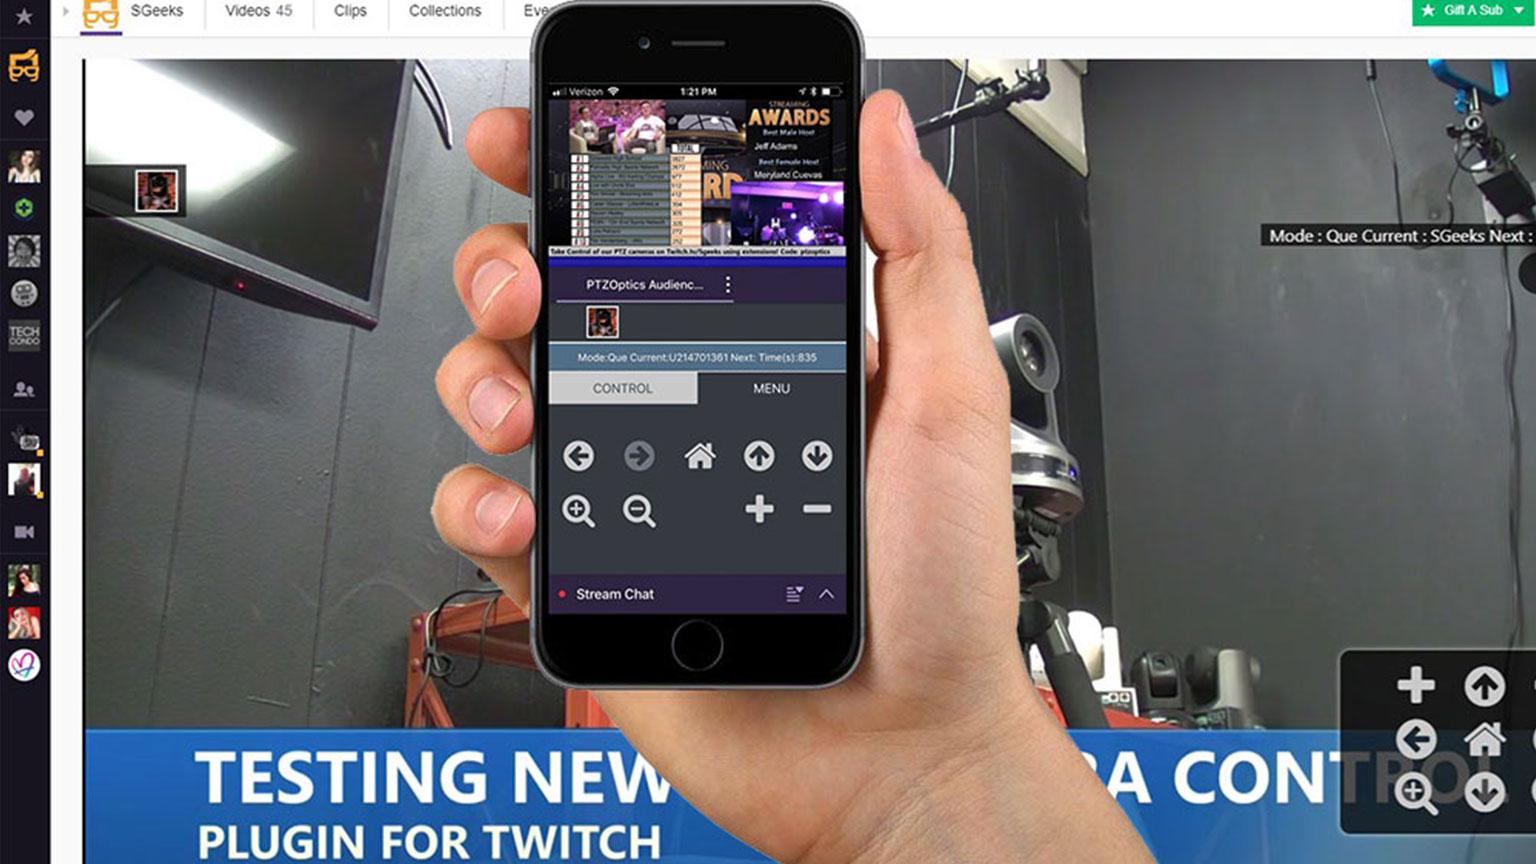 PTZ Camera Partnership with Twitch